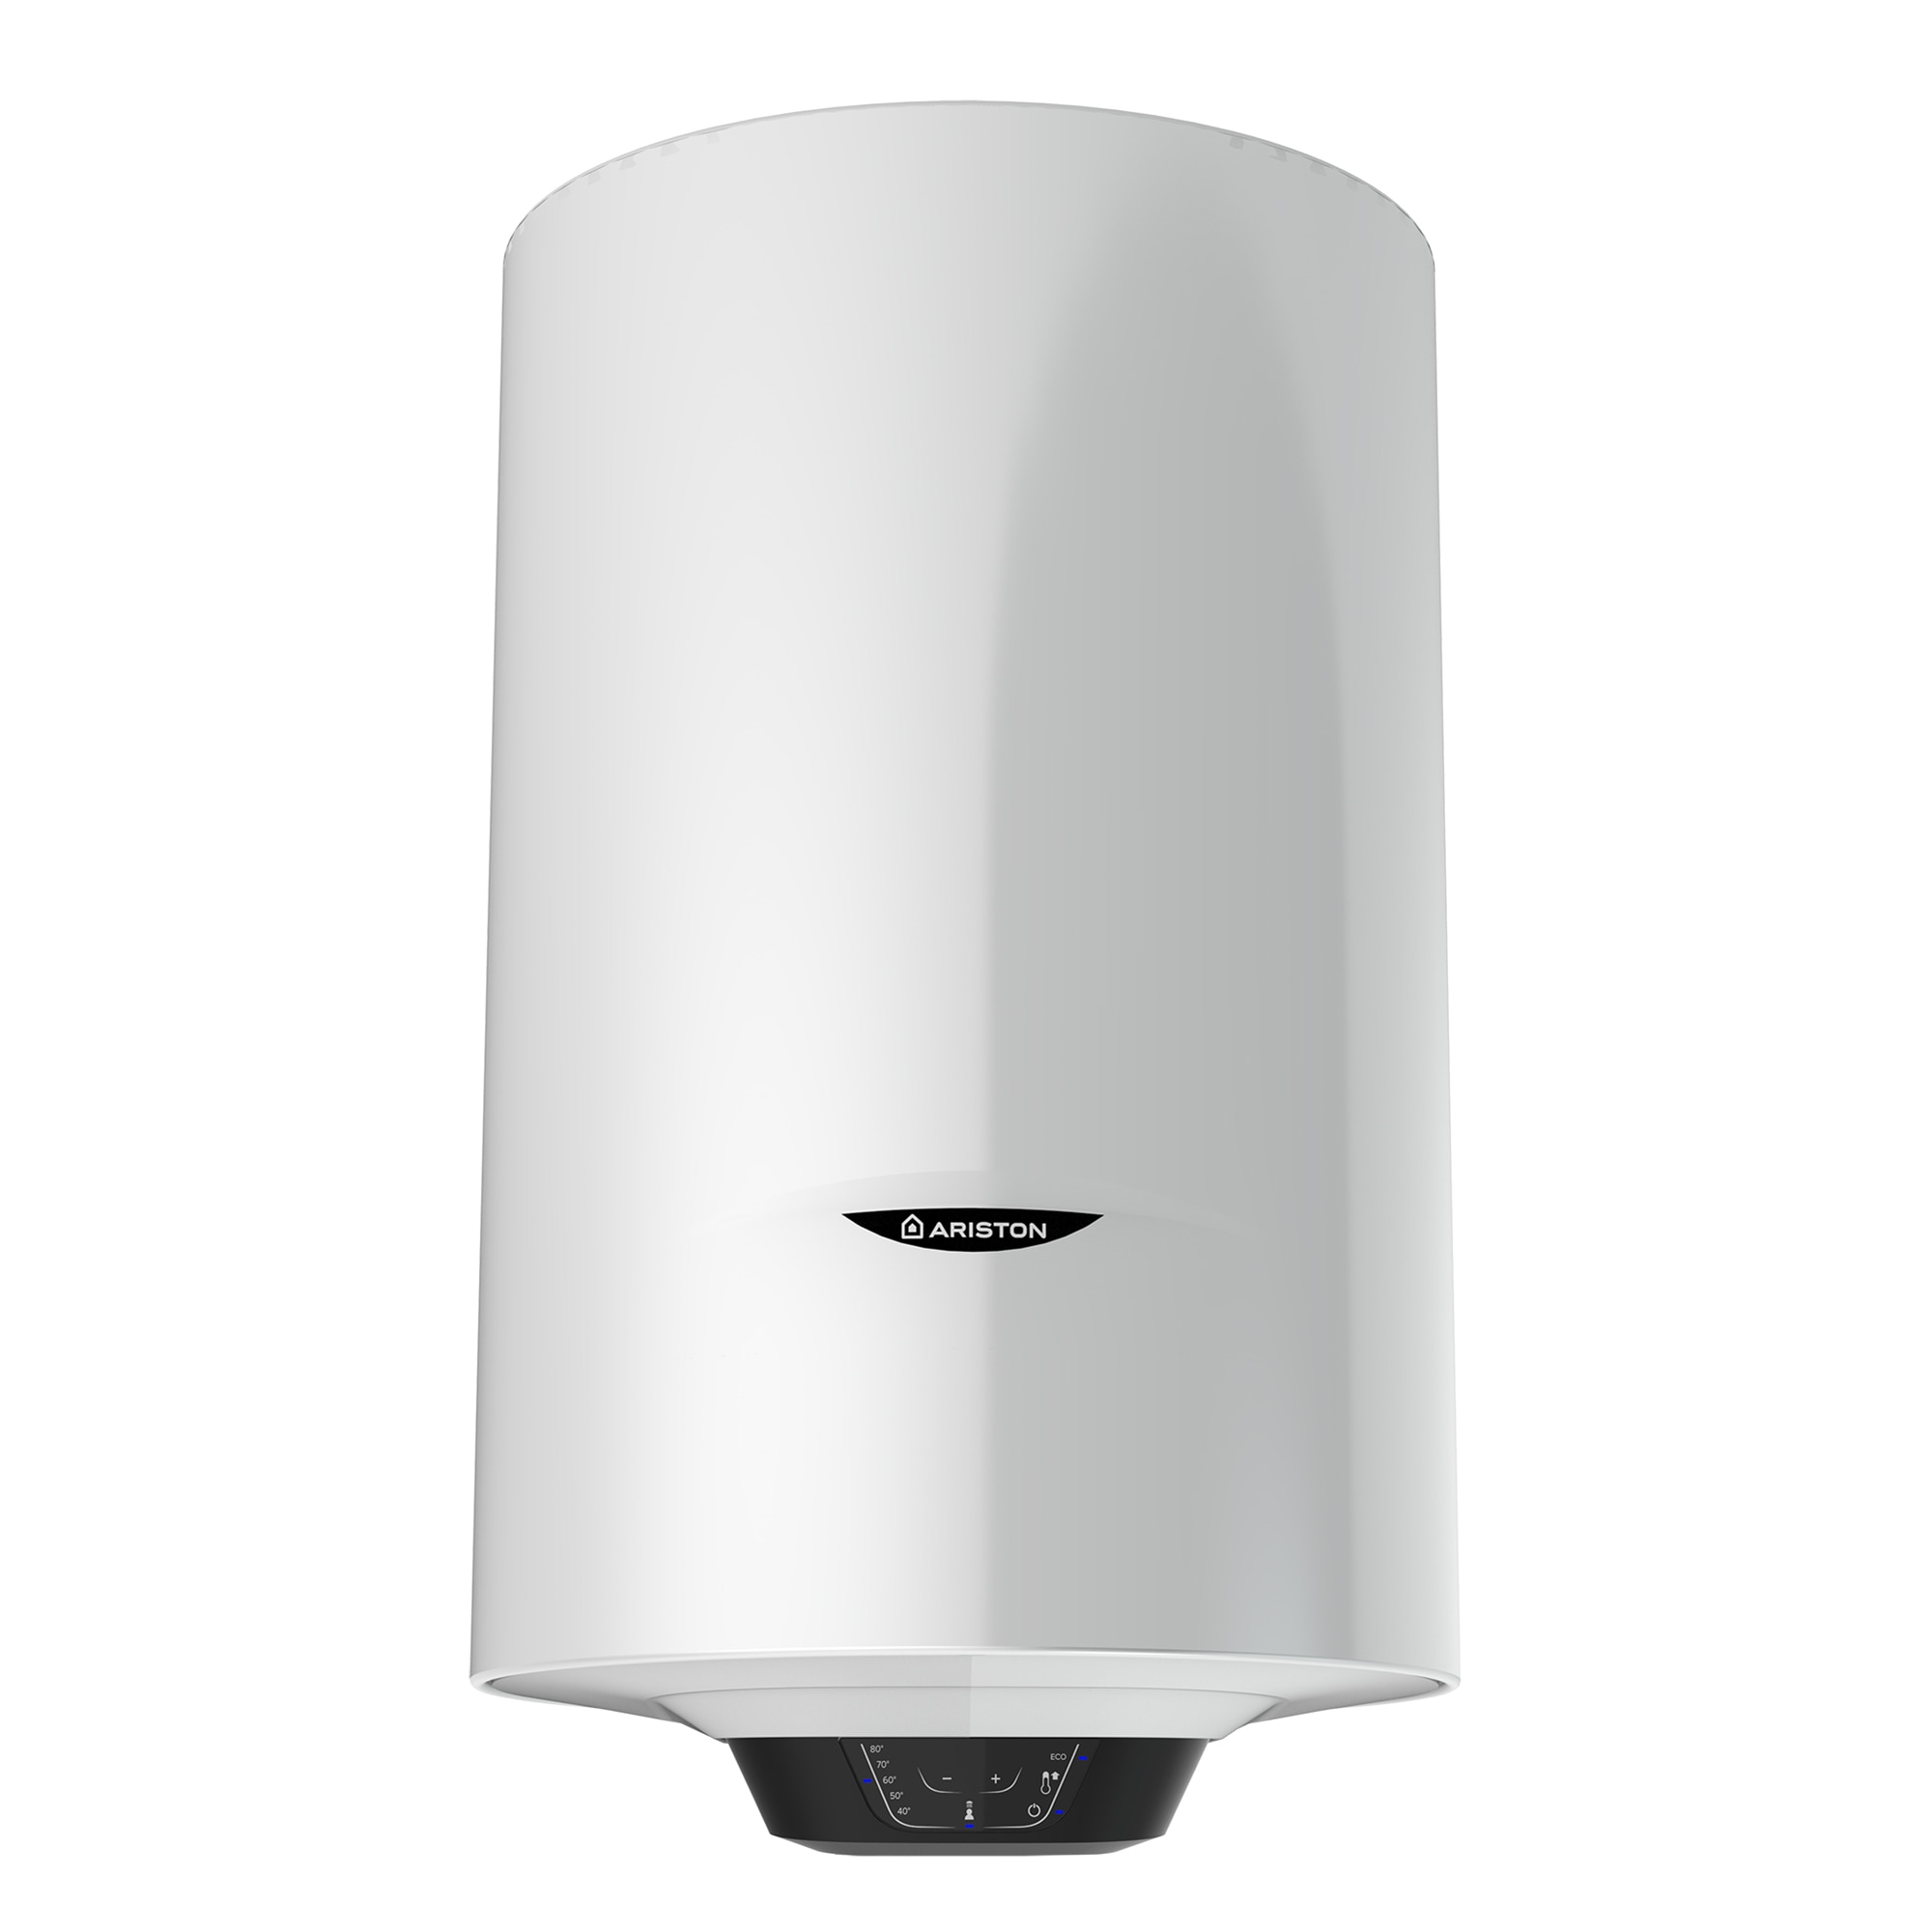 Fotografie Boiler electric Ariston Pro 1 Eco 100L, 1800 W, functie Eco Evo, rezervor emailat cu Titan